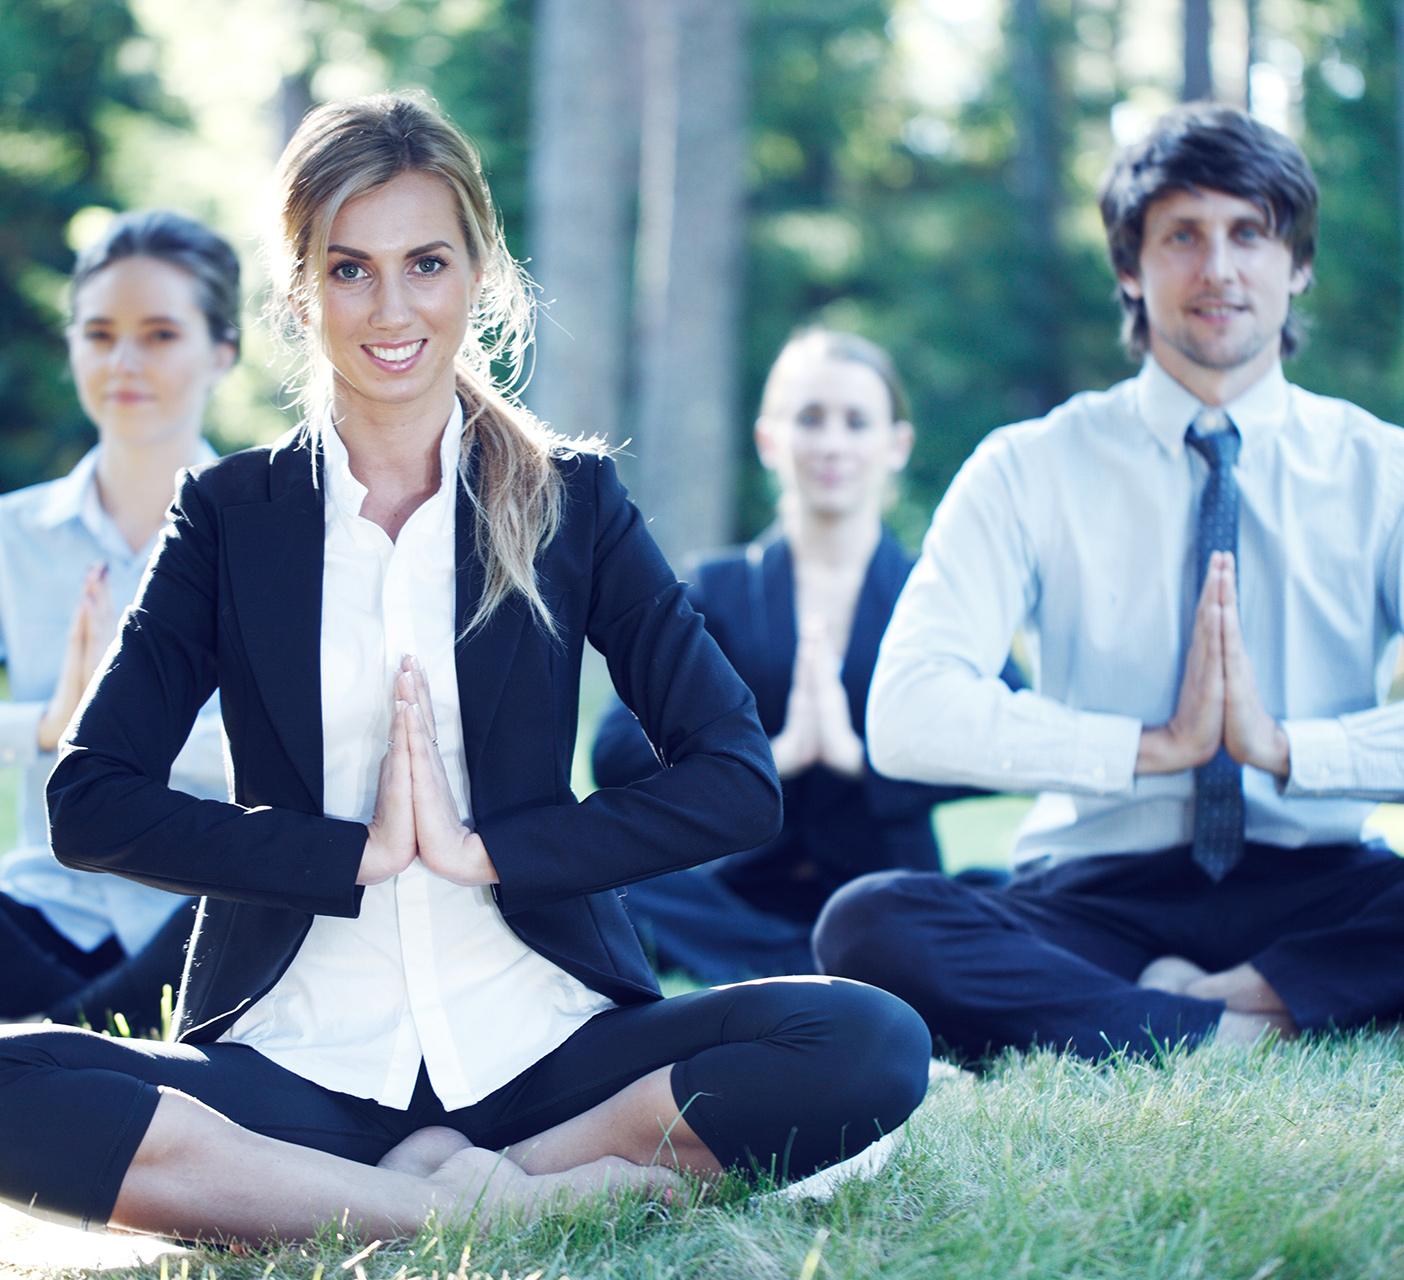 Elige el Wellness day en tu oficina